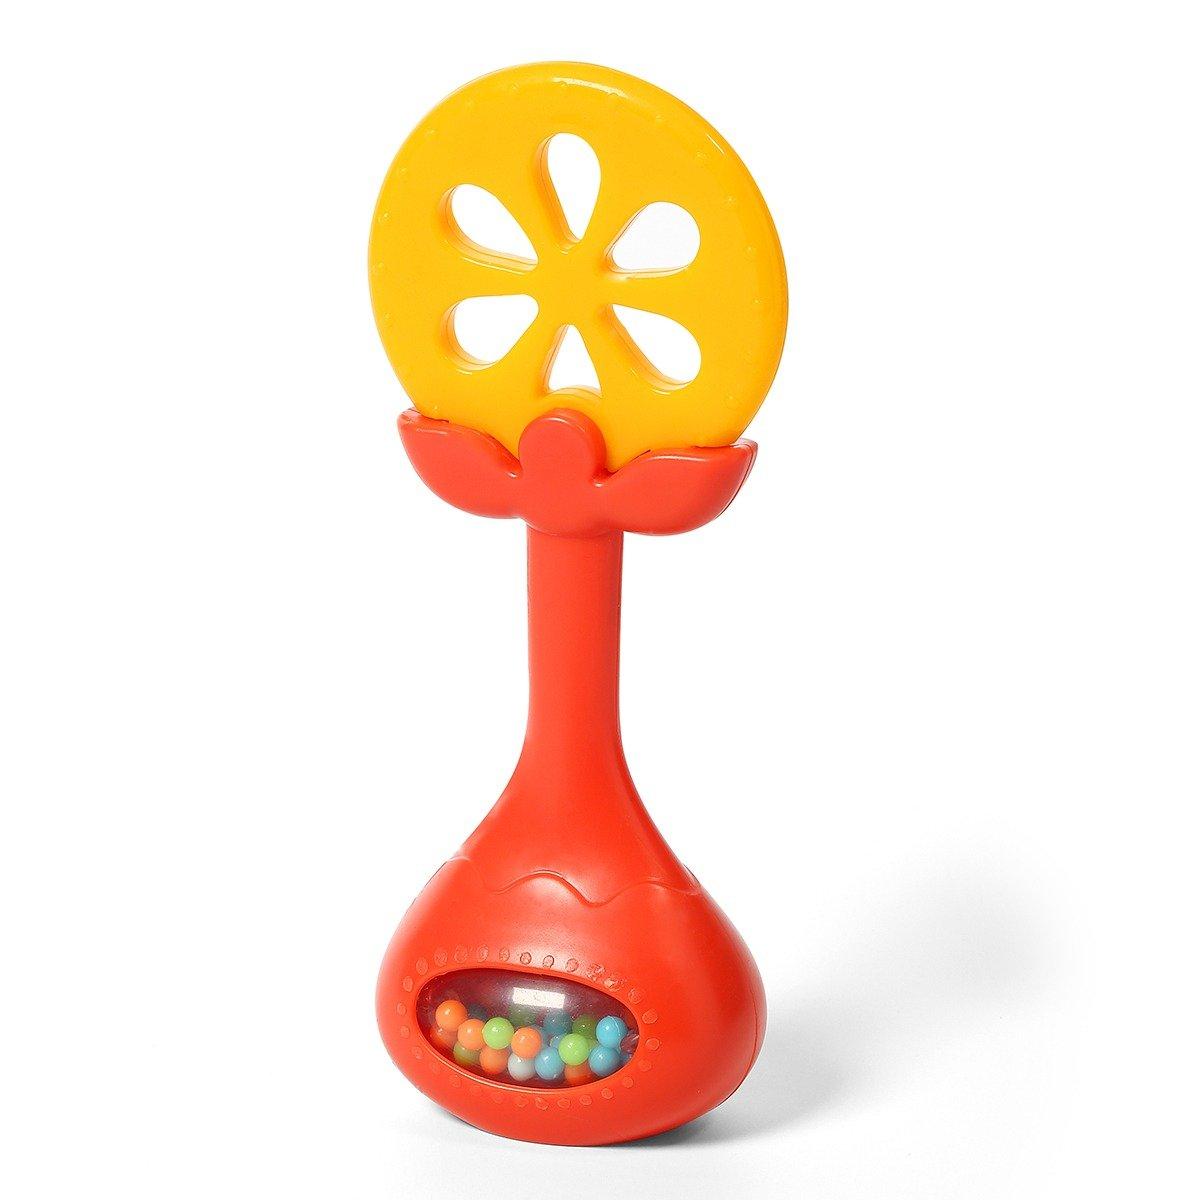 Kousátko s chrastítkem JUICY pomeranè - zvìtšit obrázek